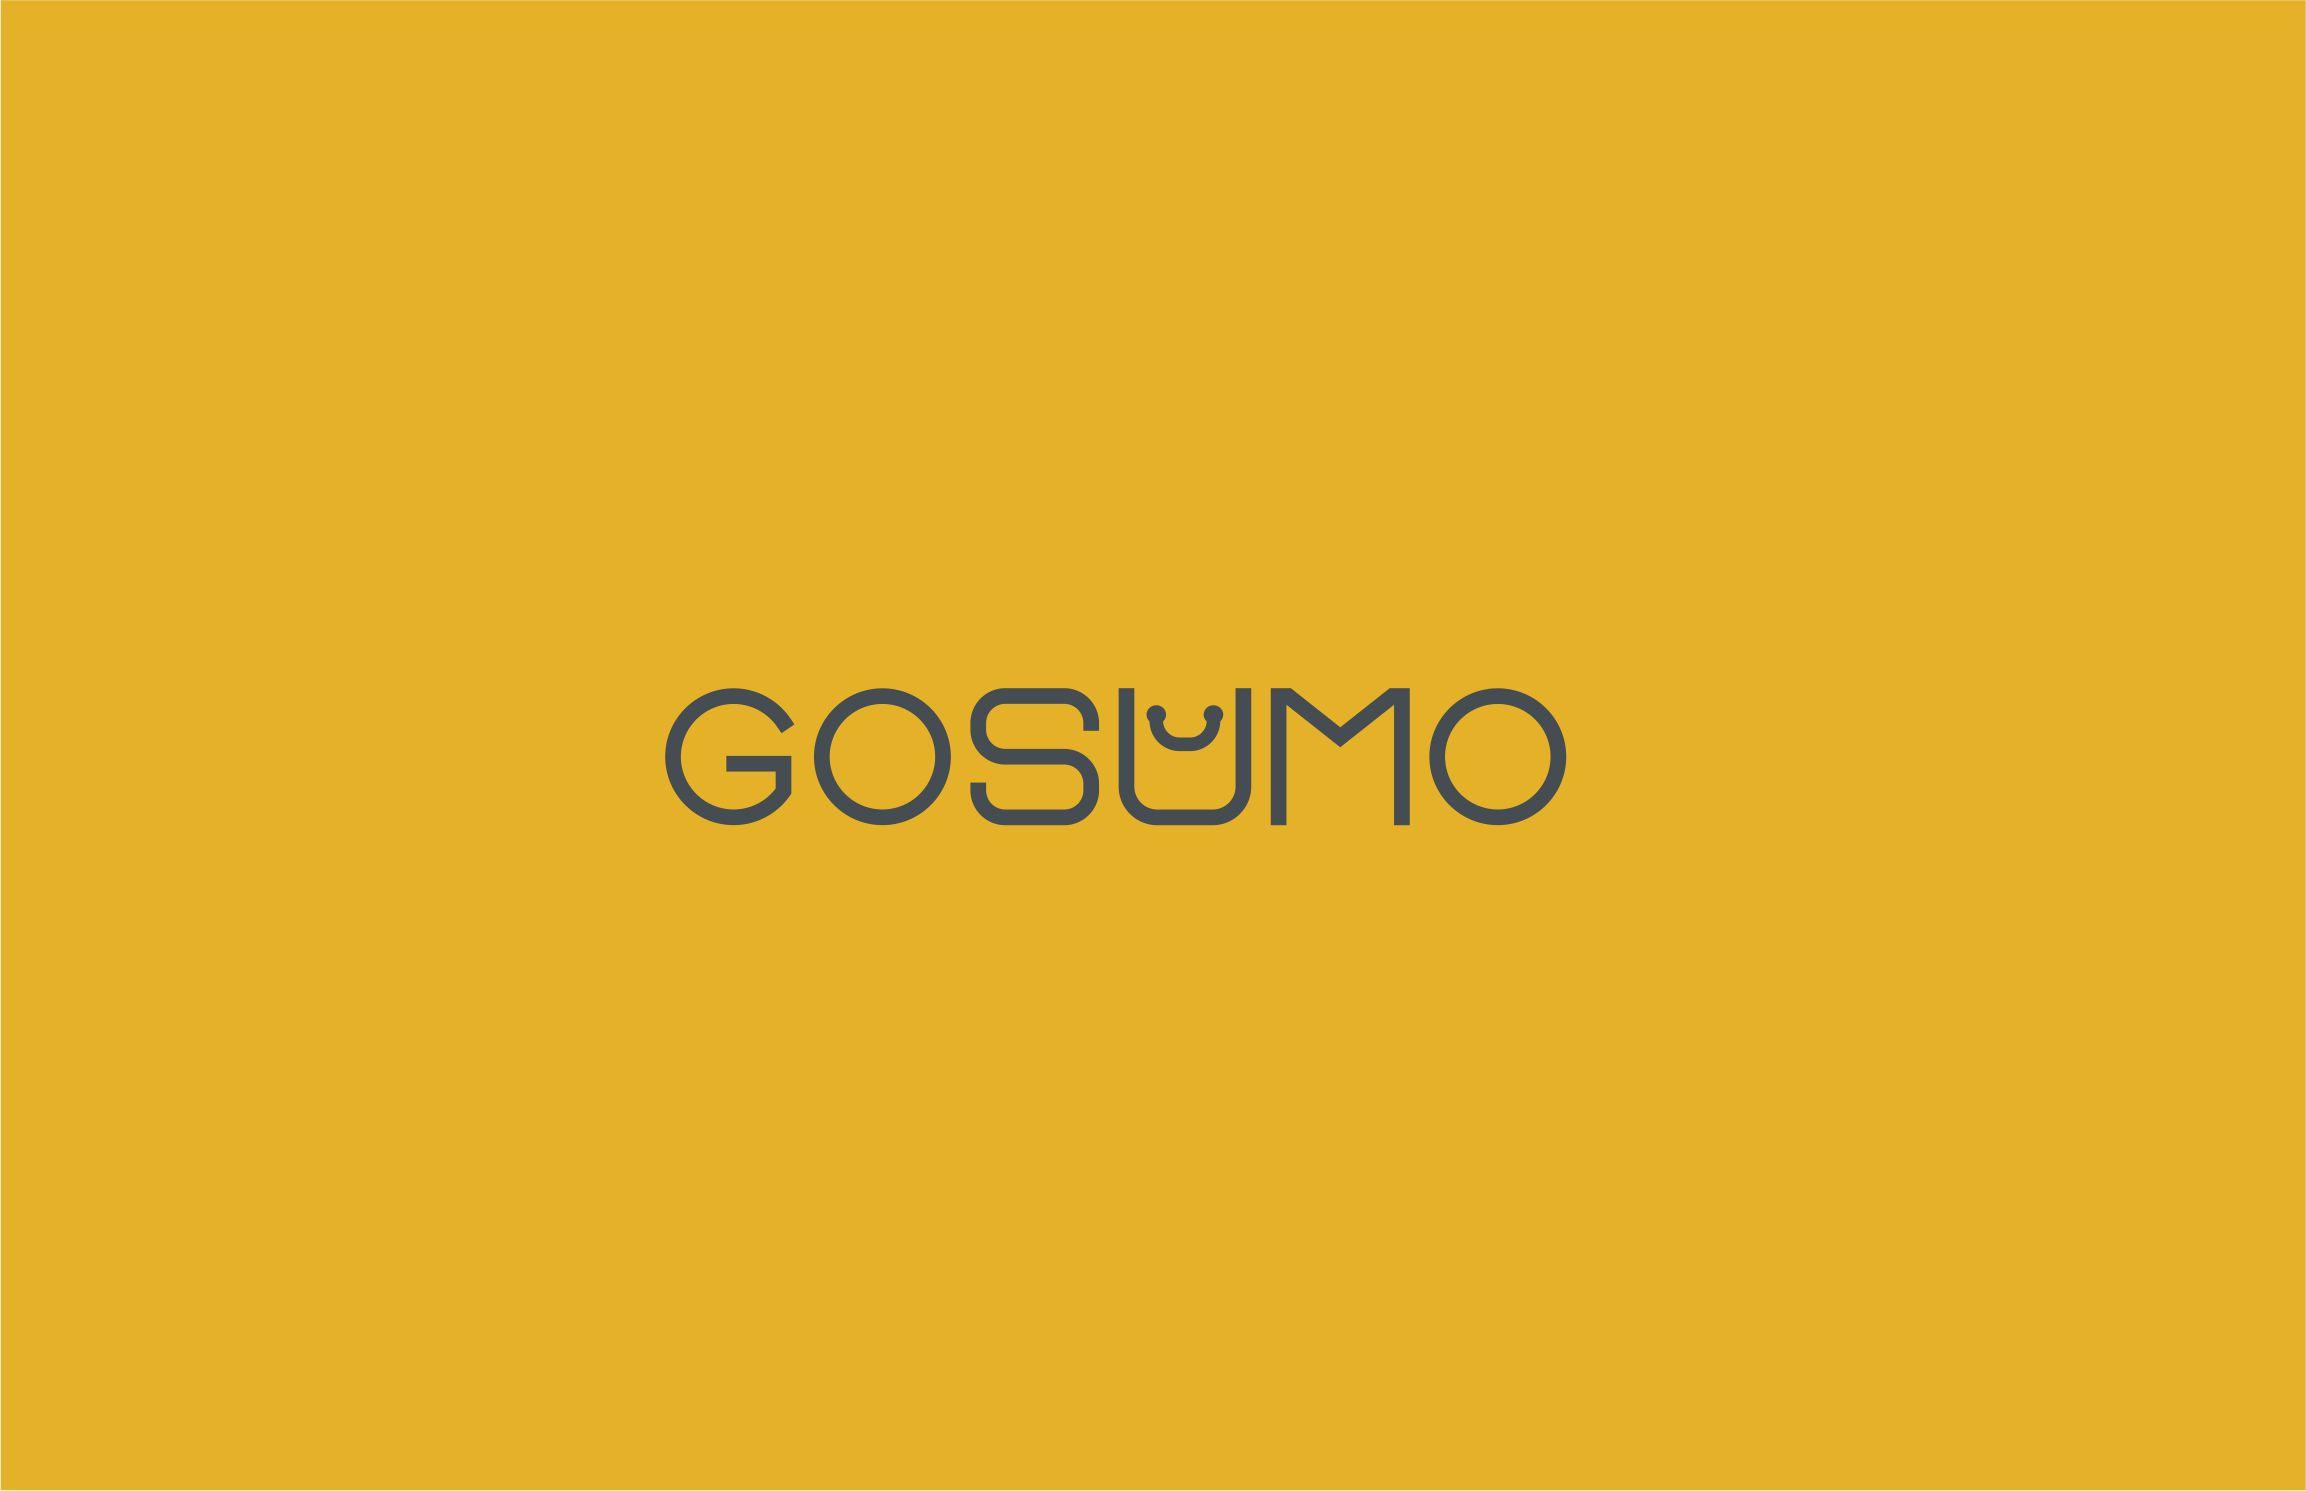 Ecommerce Site needs a LOGO for fashion bargains & BIG SALES!